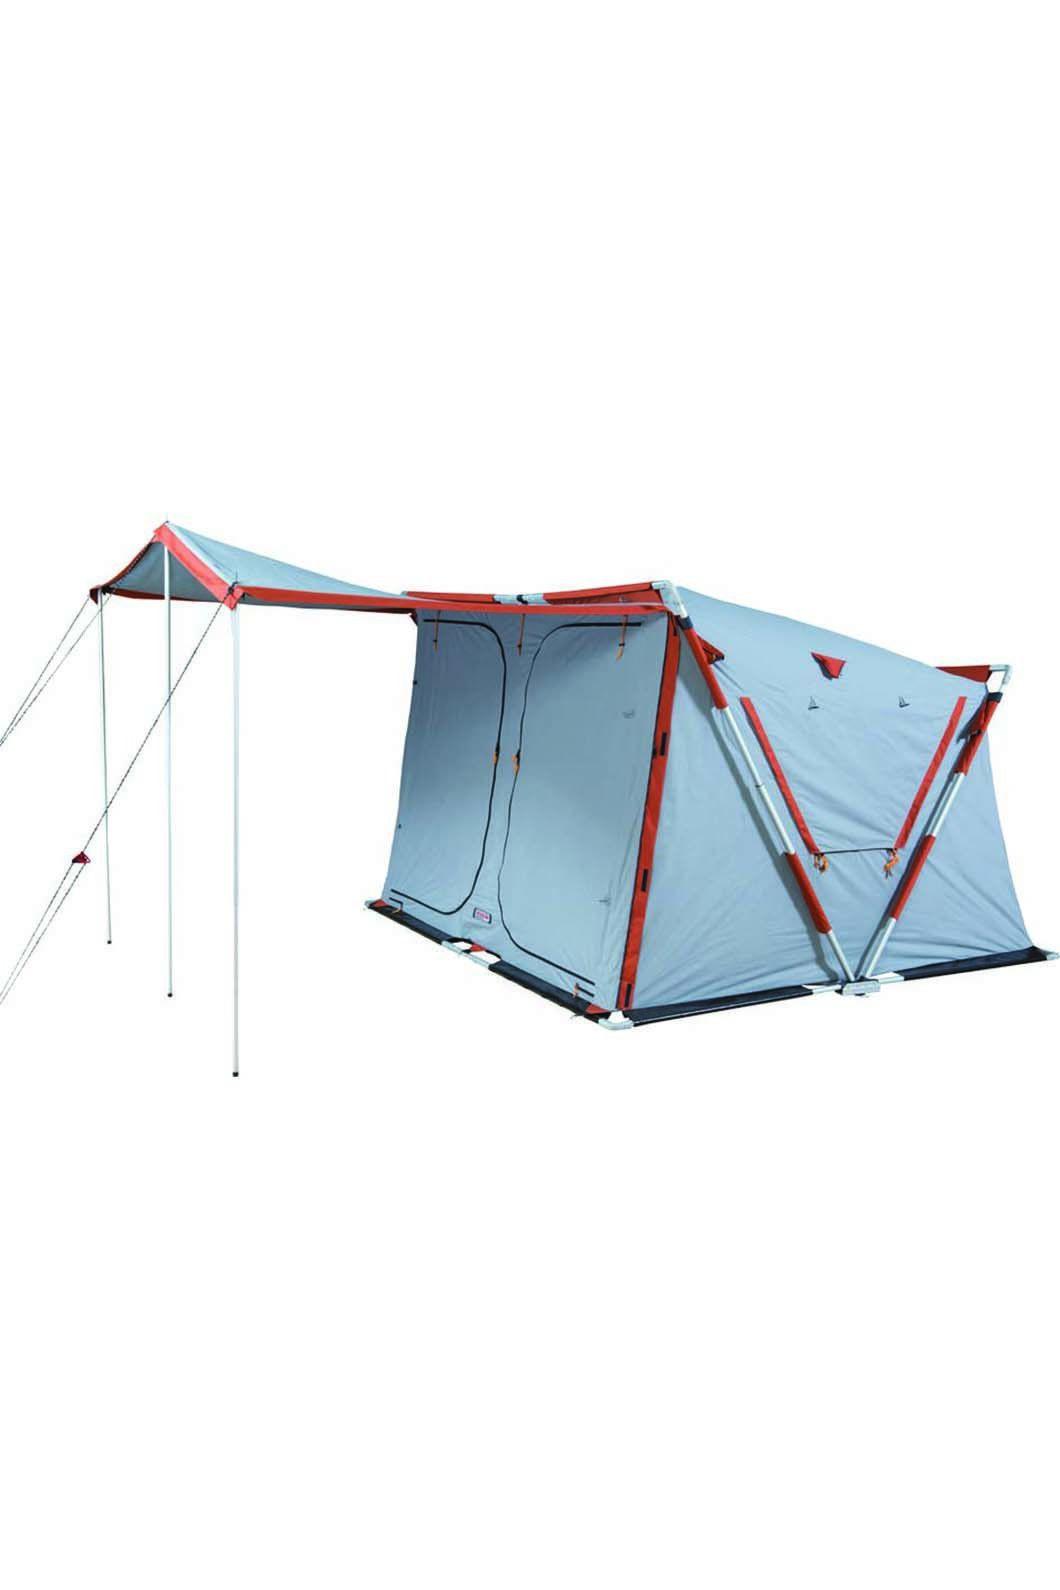 Explore Planet Earth Speedy Earth 6 Person Instant Tent, None, hi-res